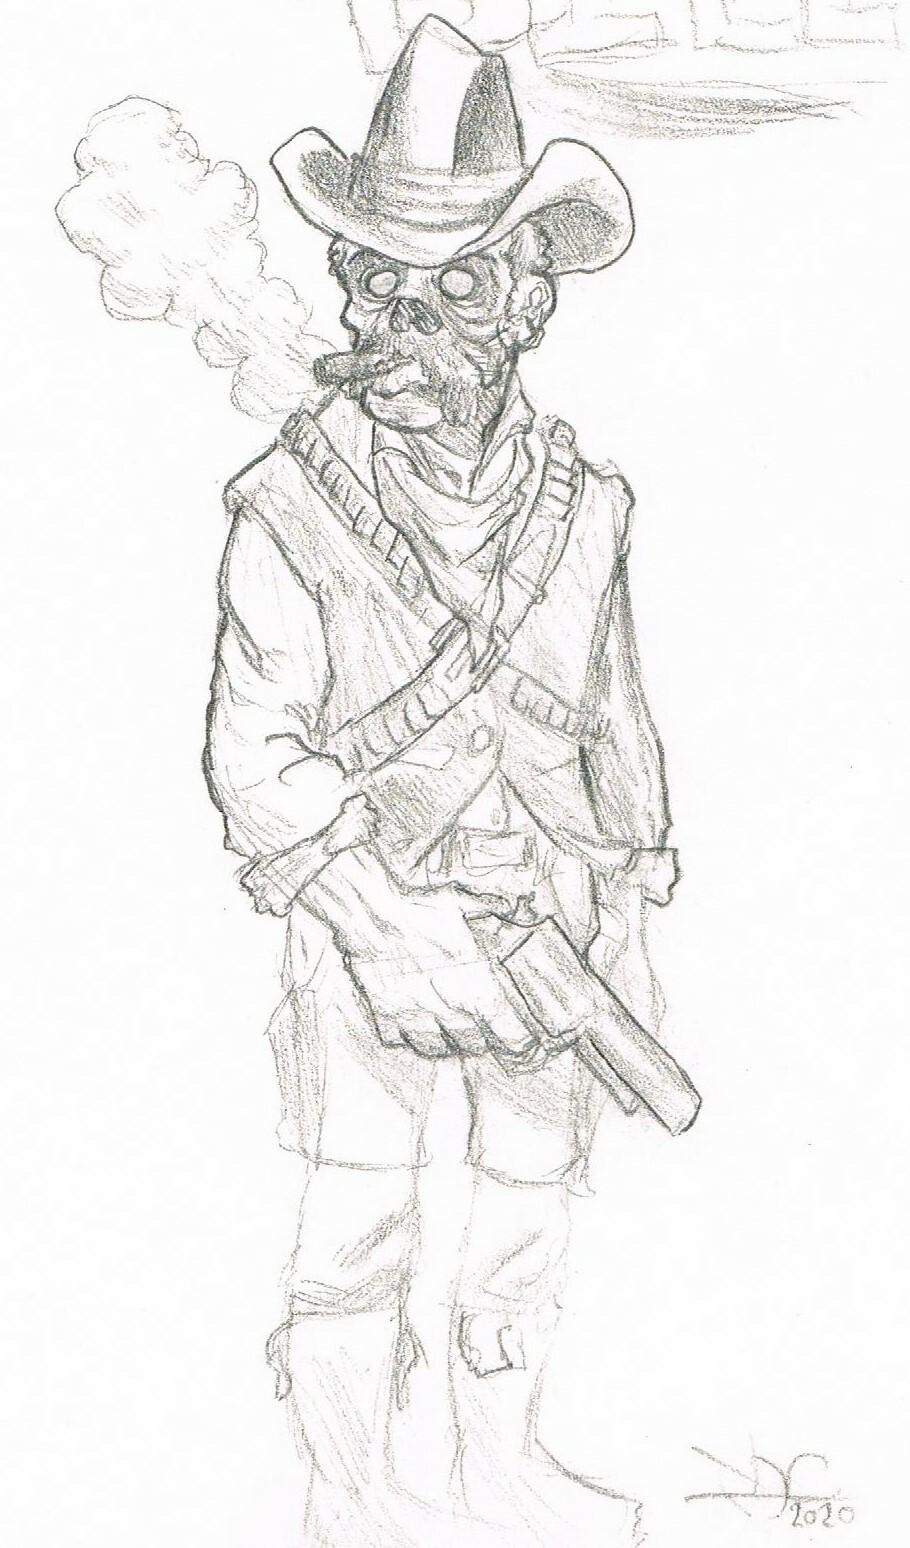 A sketch of a friend's character, Dapper Bill